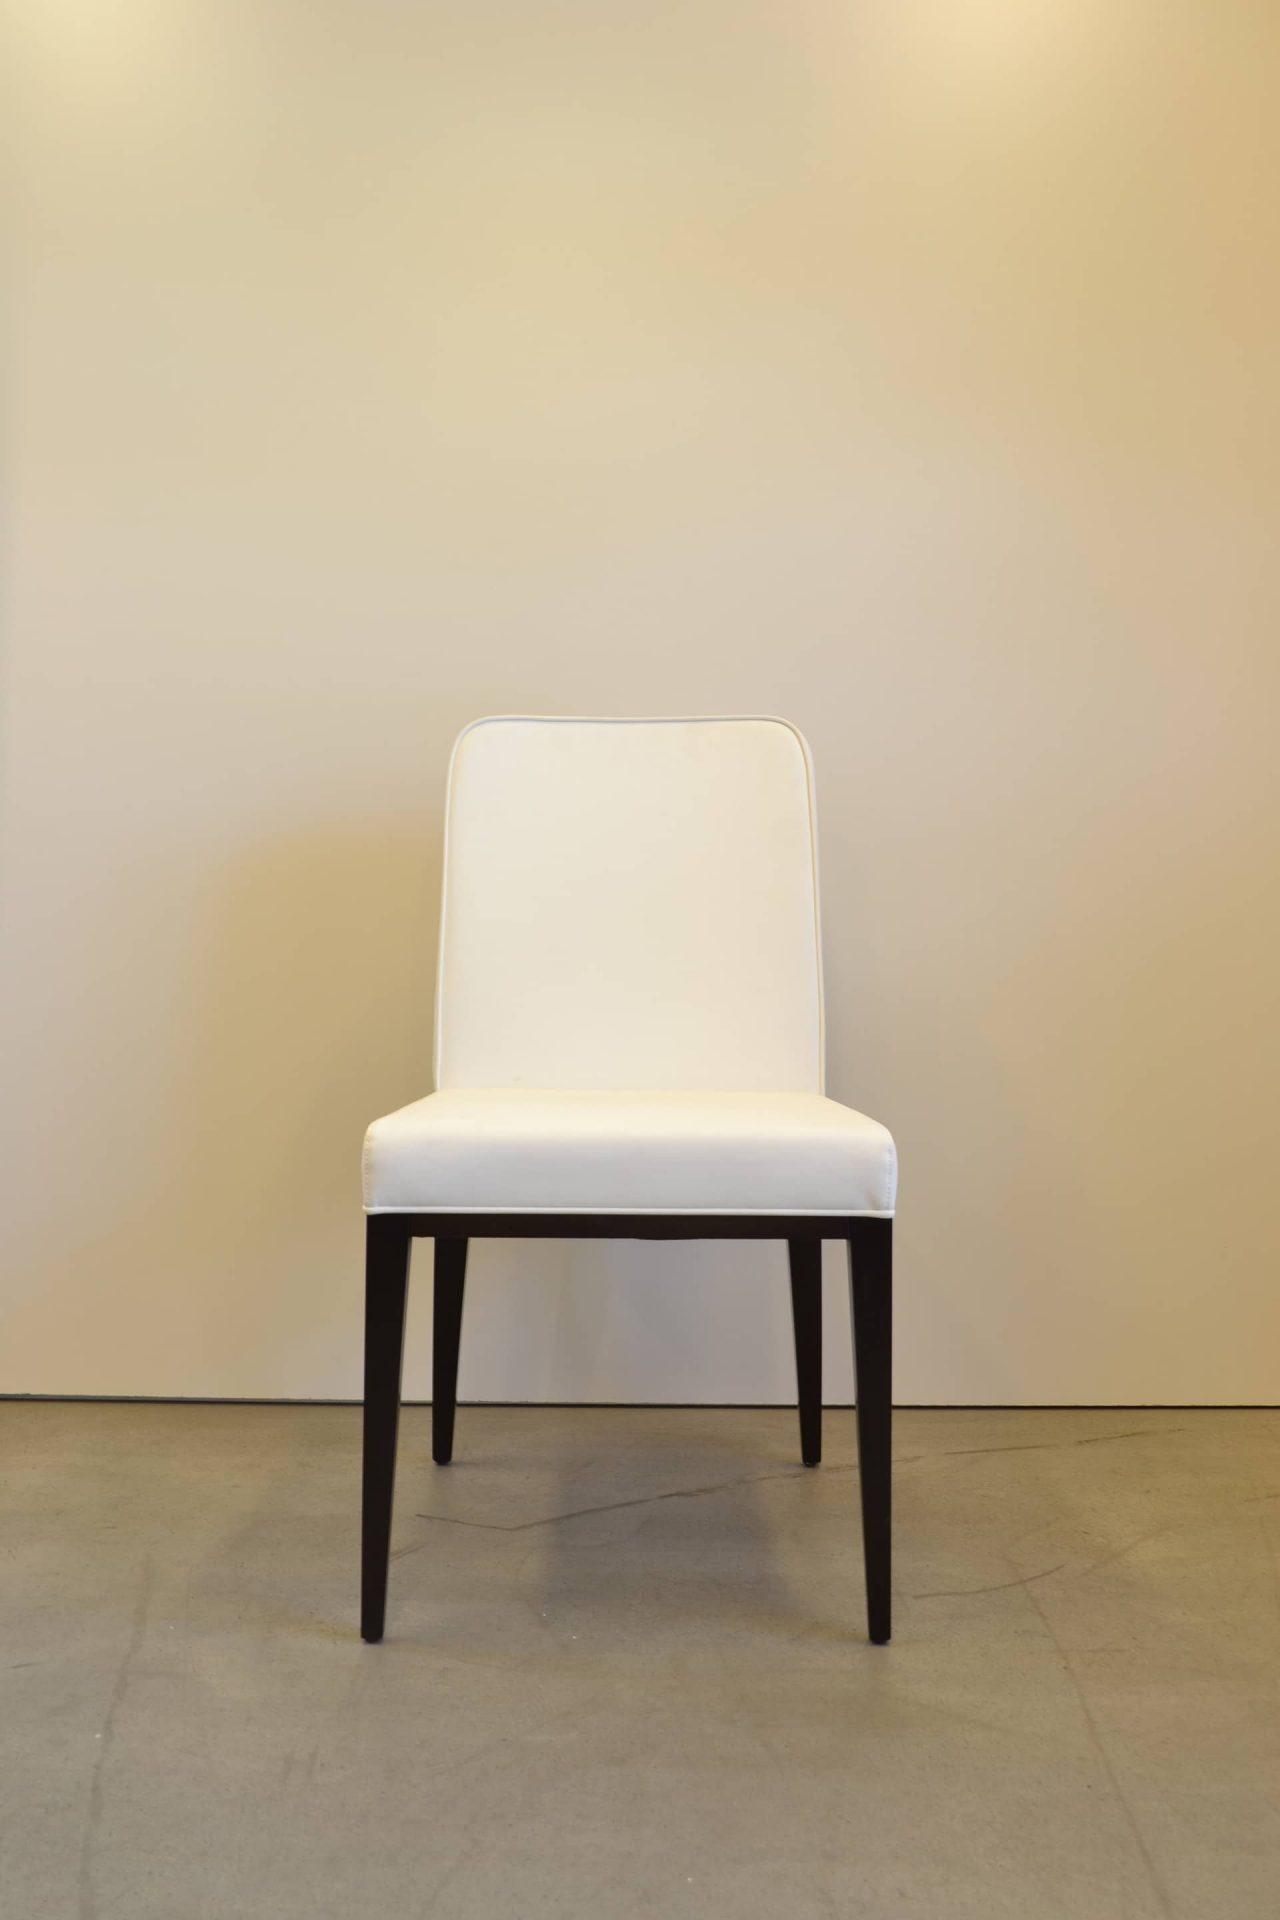 Stuhl Kunstleder — M Studio Reiter Altenmarkt